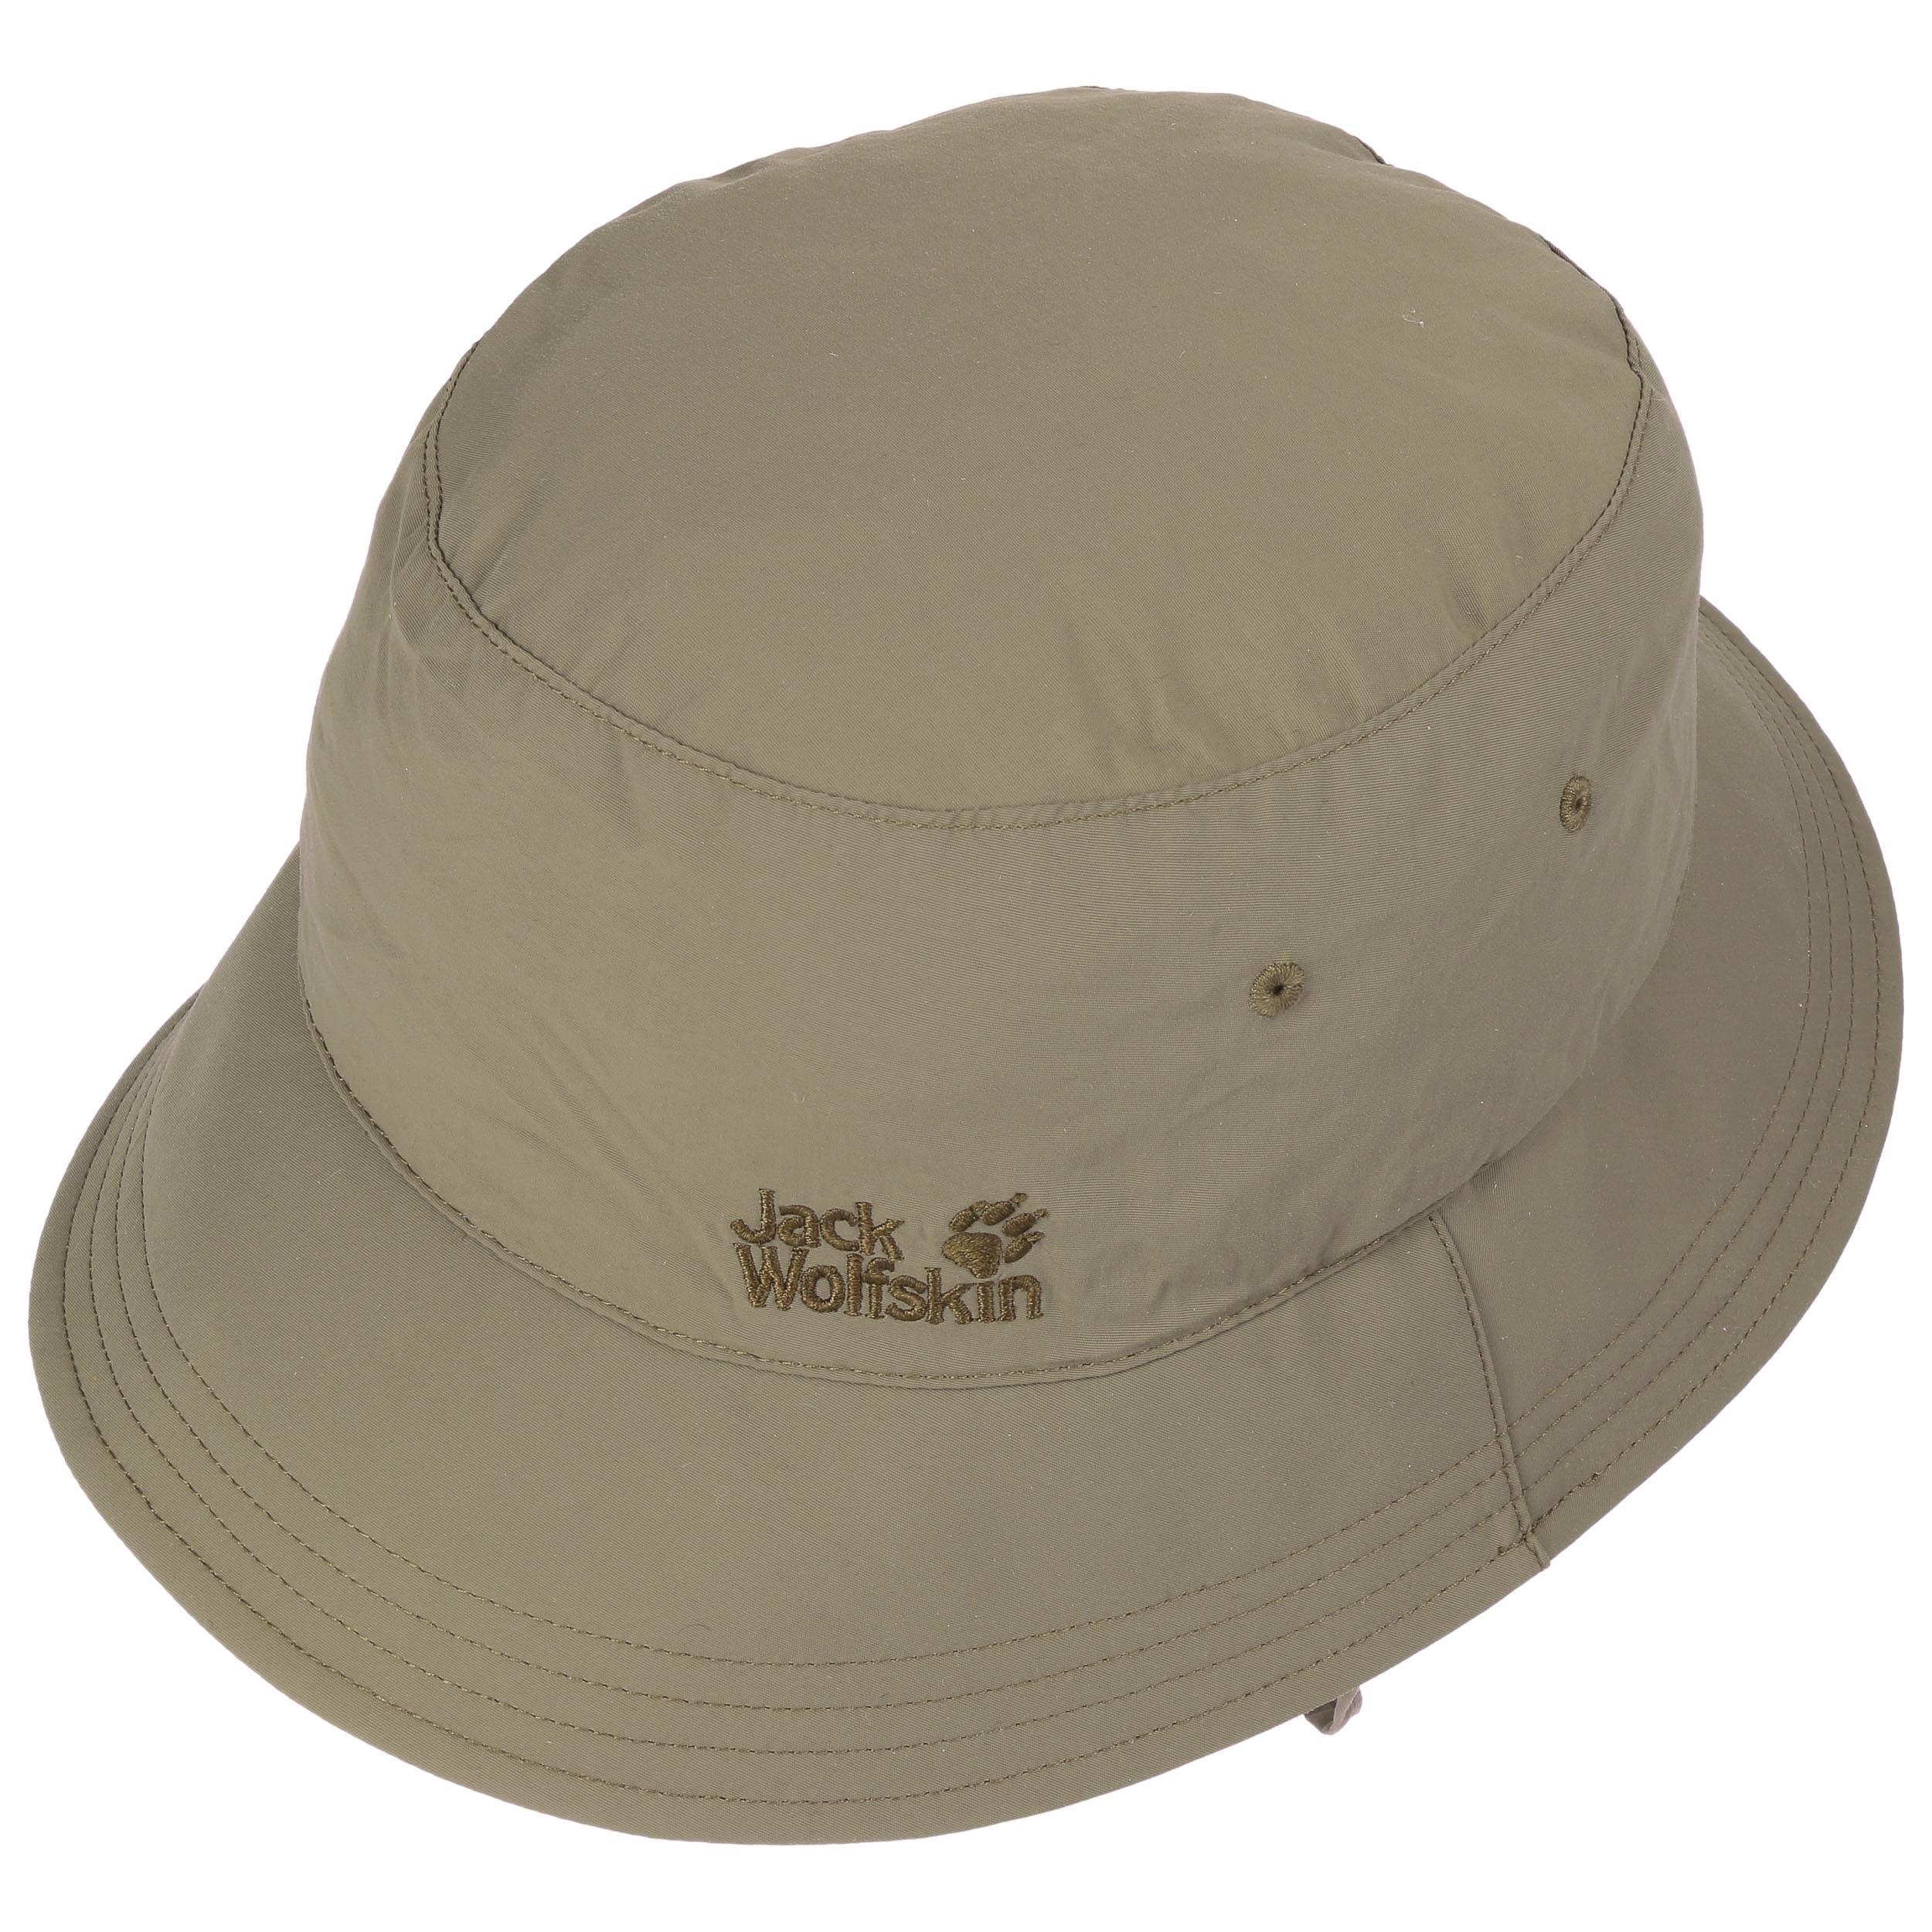 b3fffbc1e9b4e Supplex Sun Hat by Jack Wolfskin - beige 1 ...